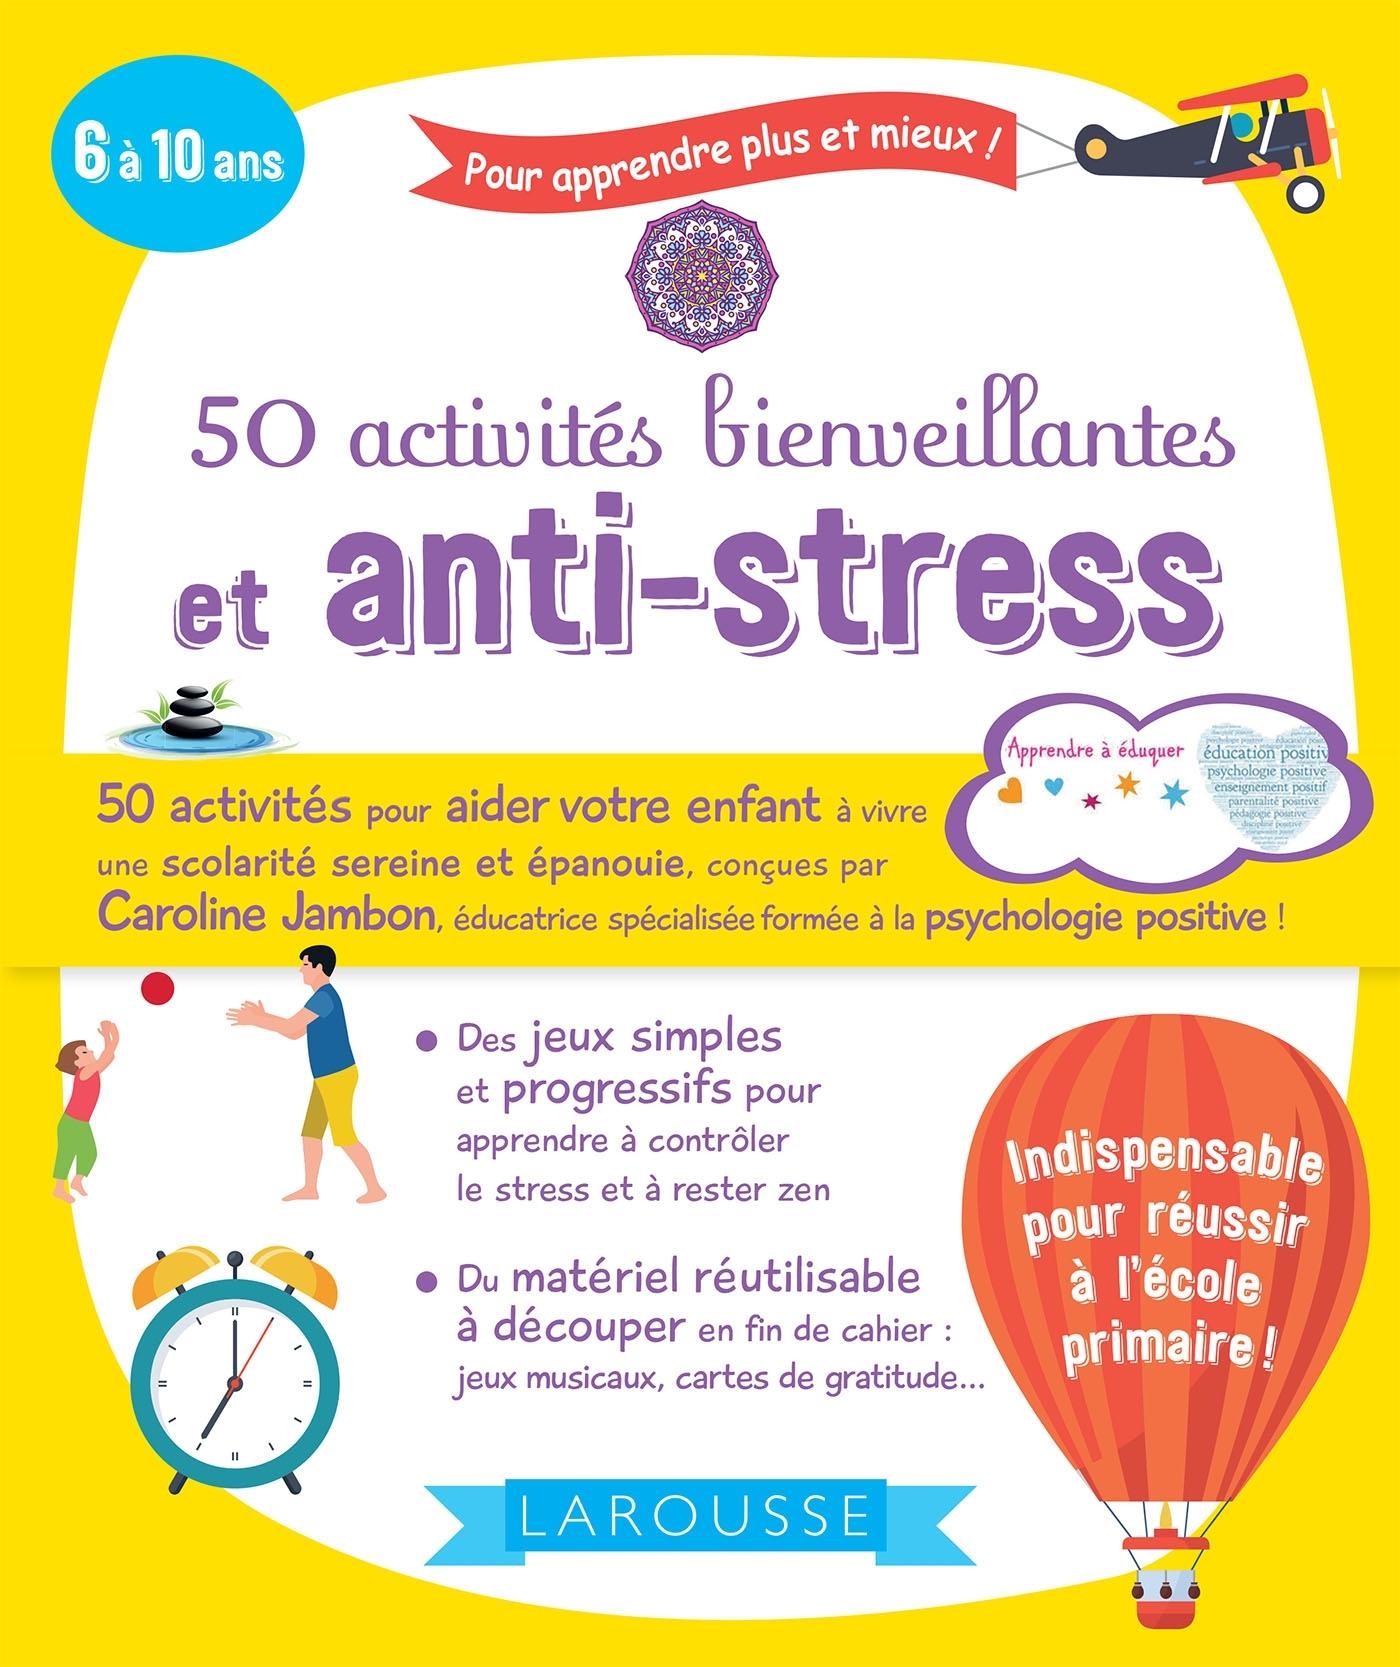 50 ACTIVITES BIENVEILLANTES ET ANTI-STRESS